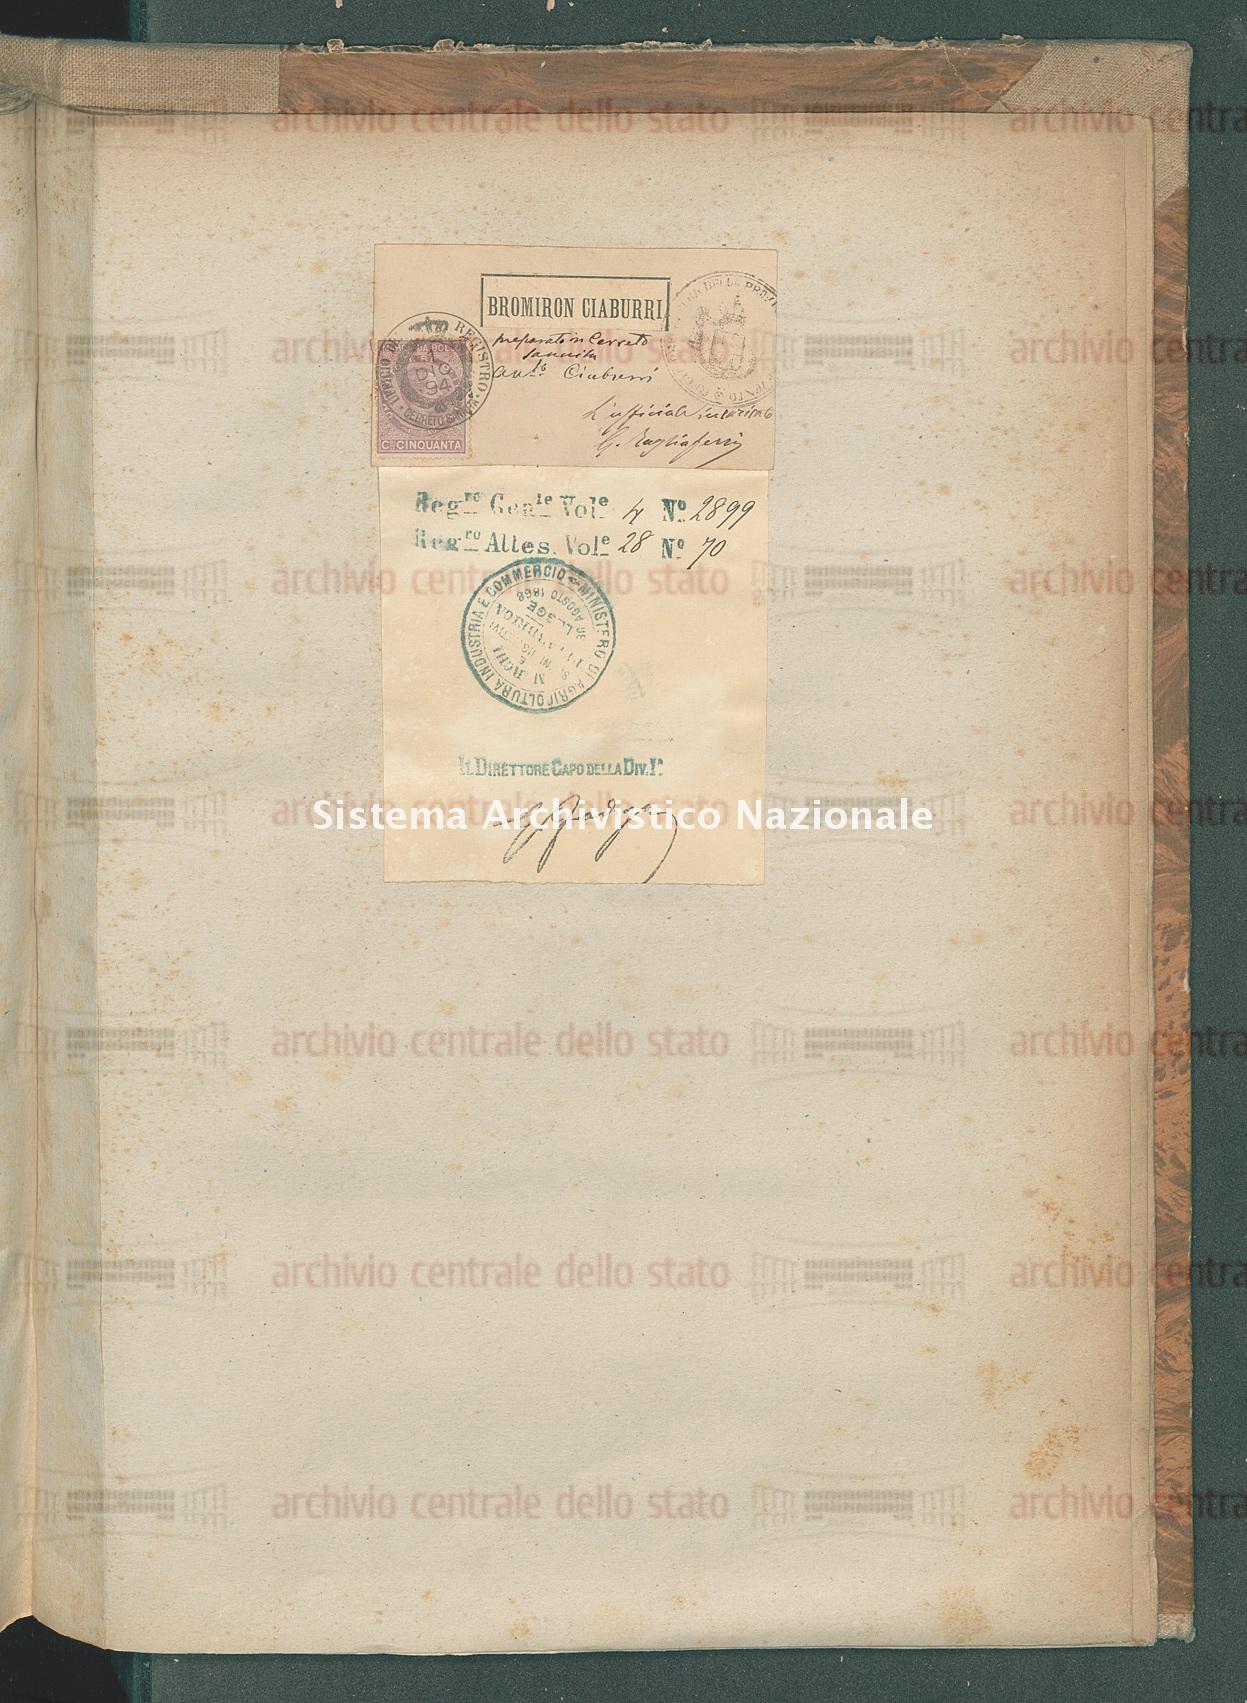 Ciaburri Antonio (18/02/1895)